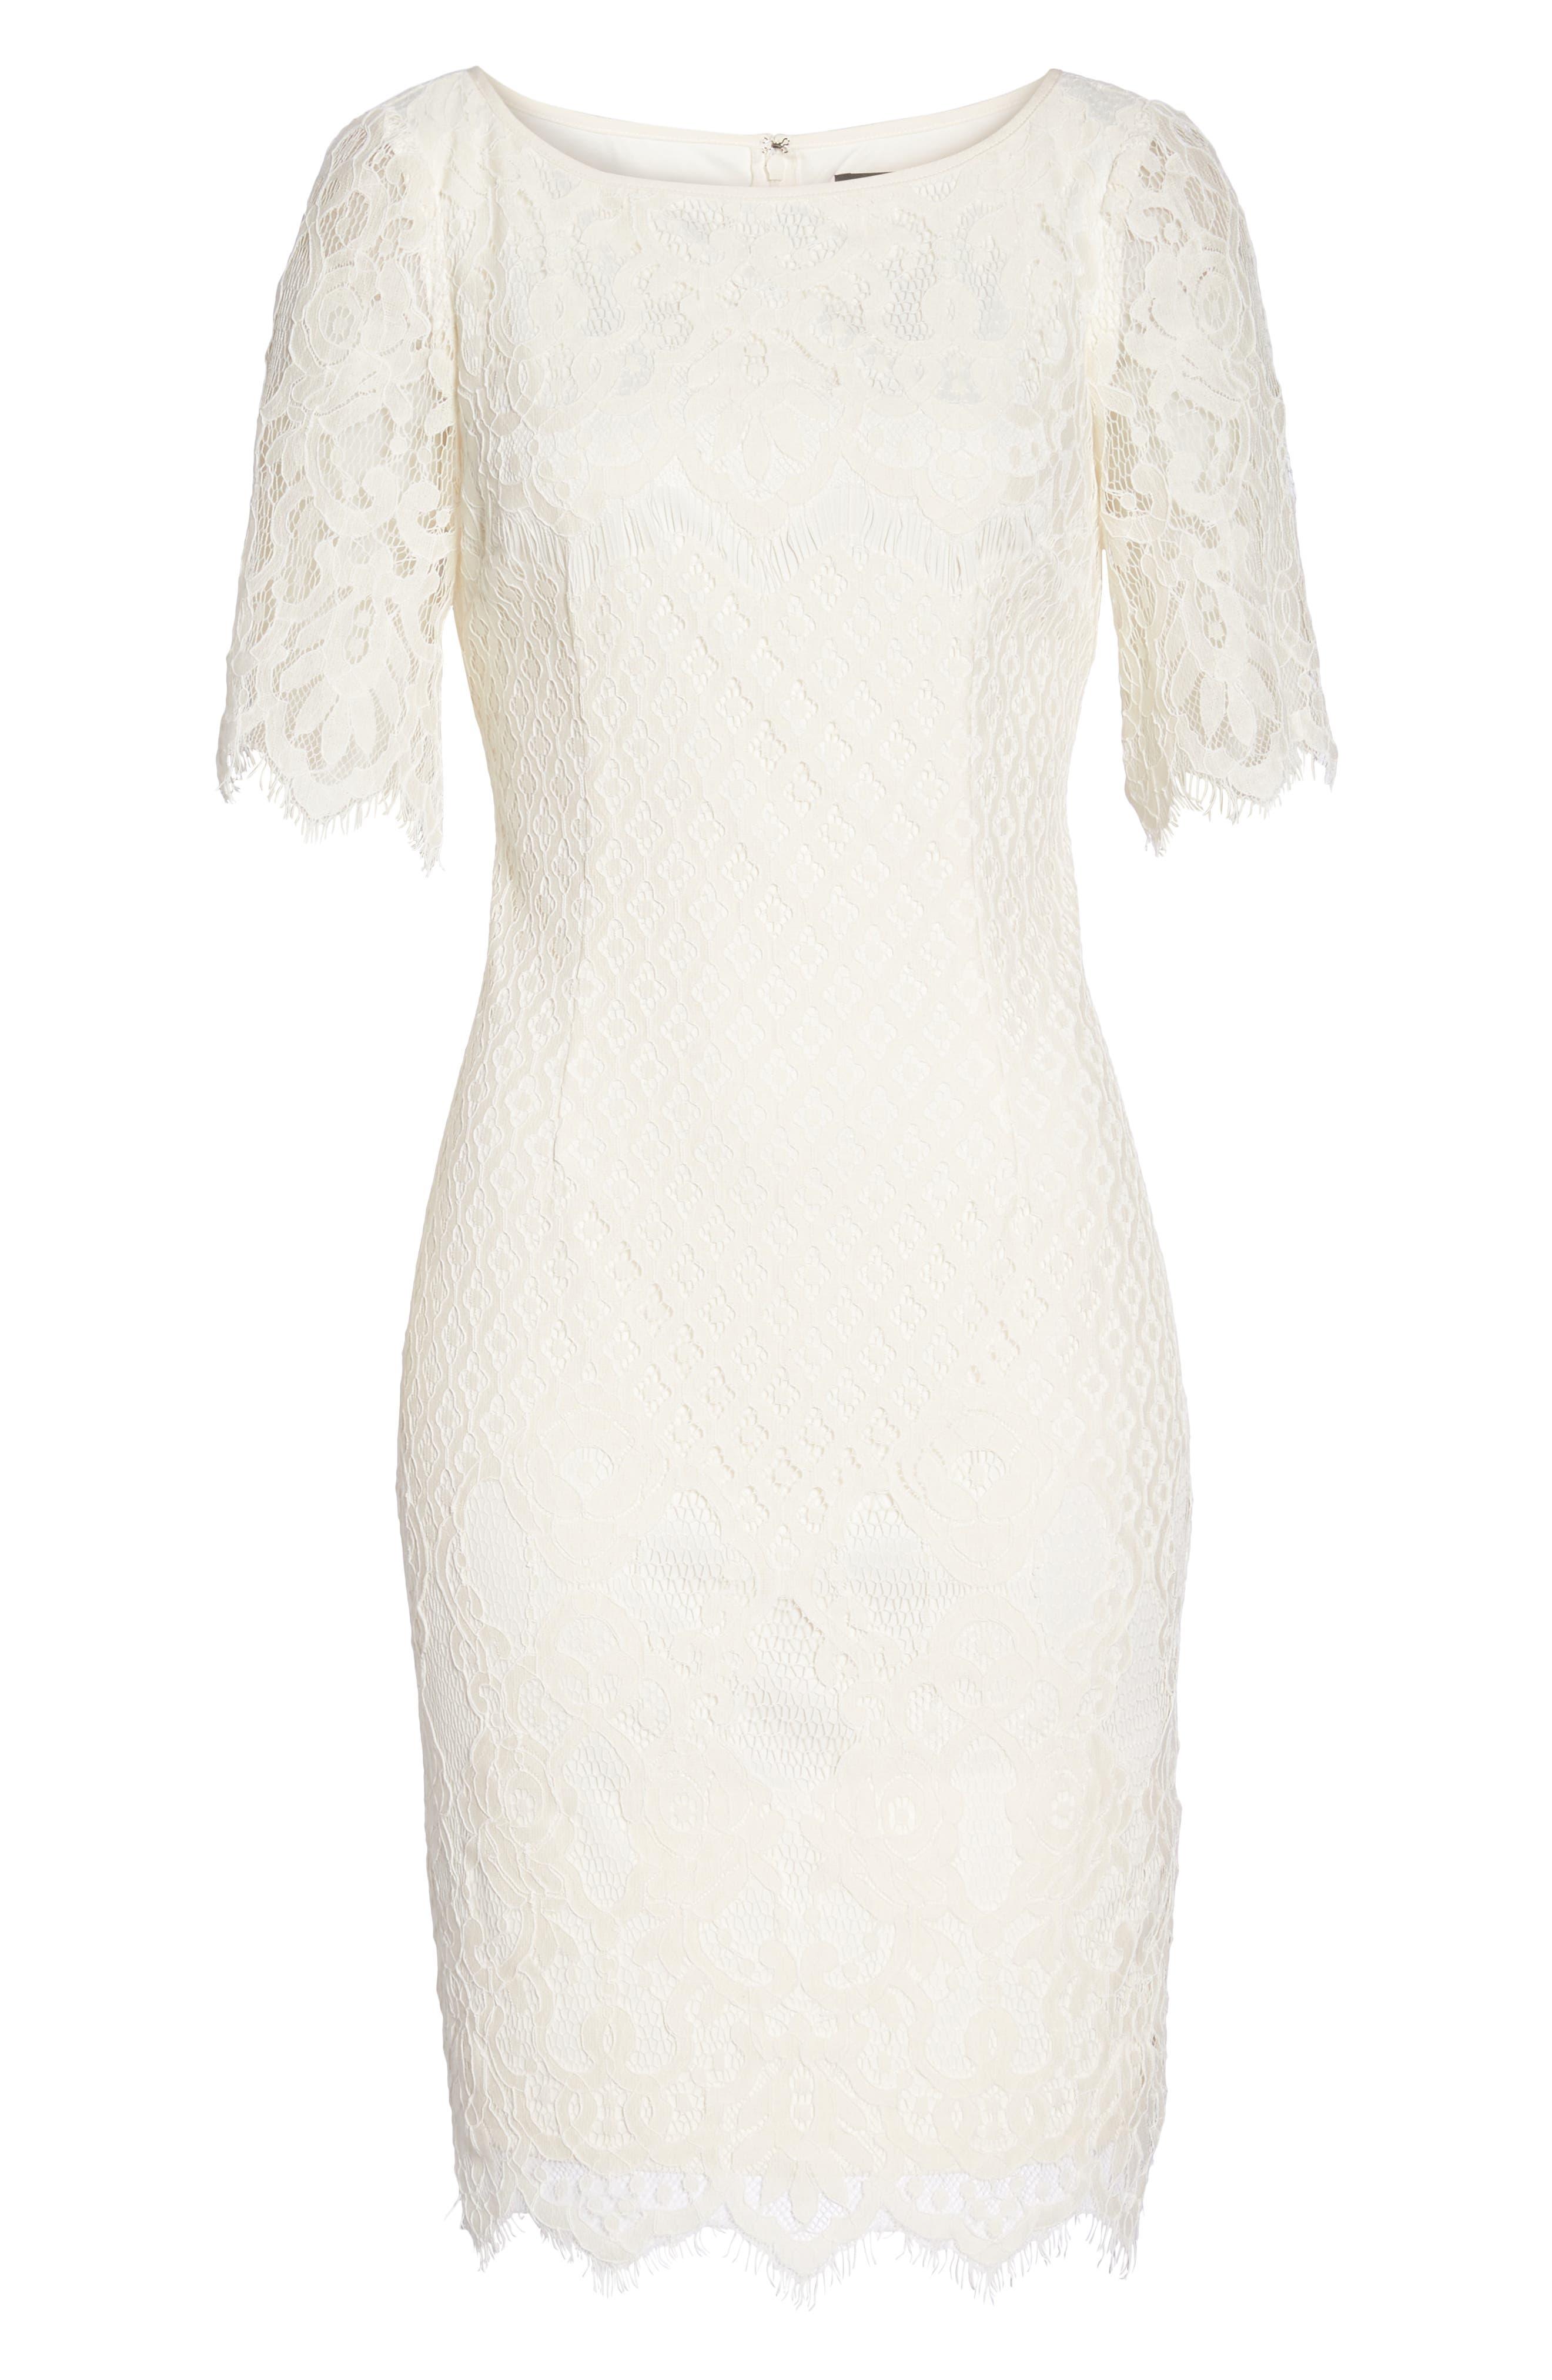 Georgia Scalloped Lace Sheath Dress,                             Alternate thumbnail 7, color,                             904